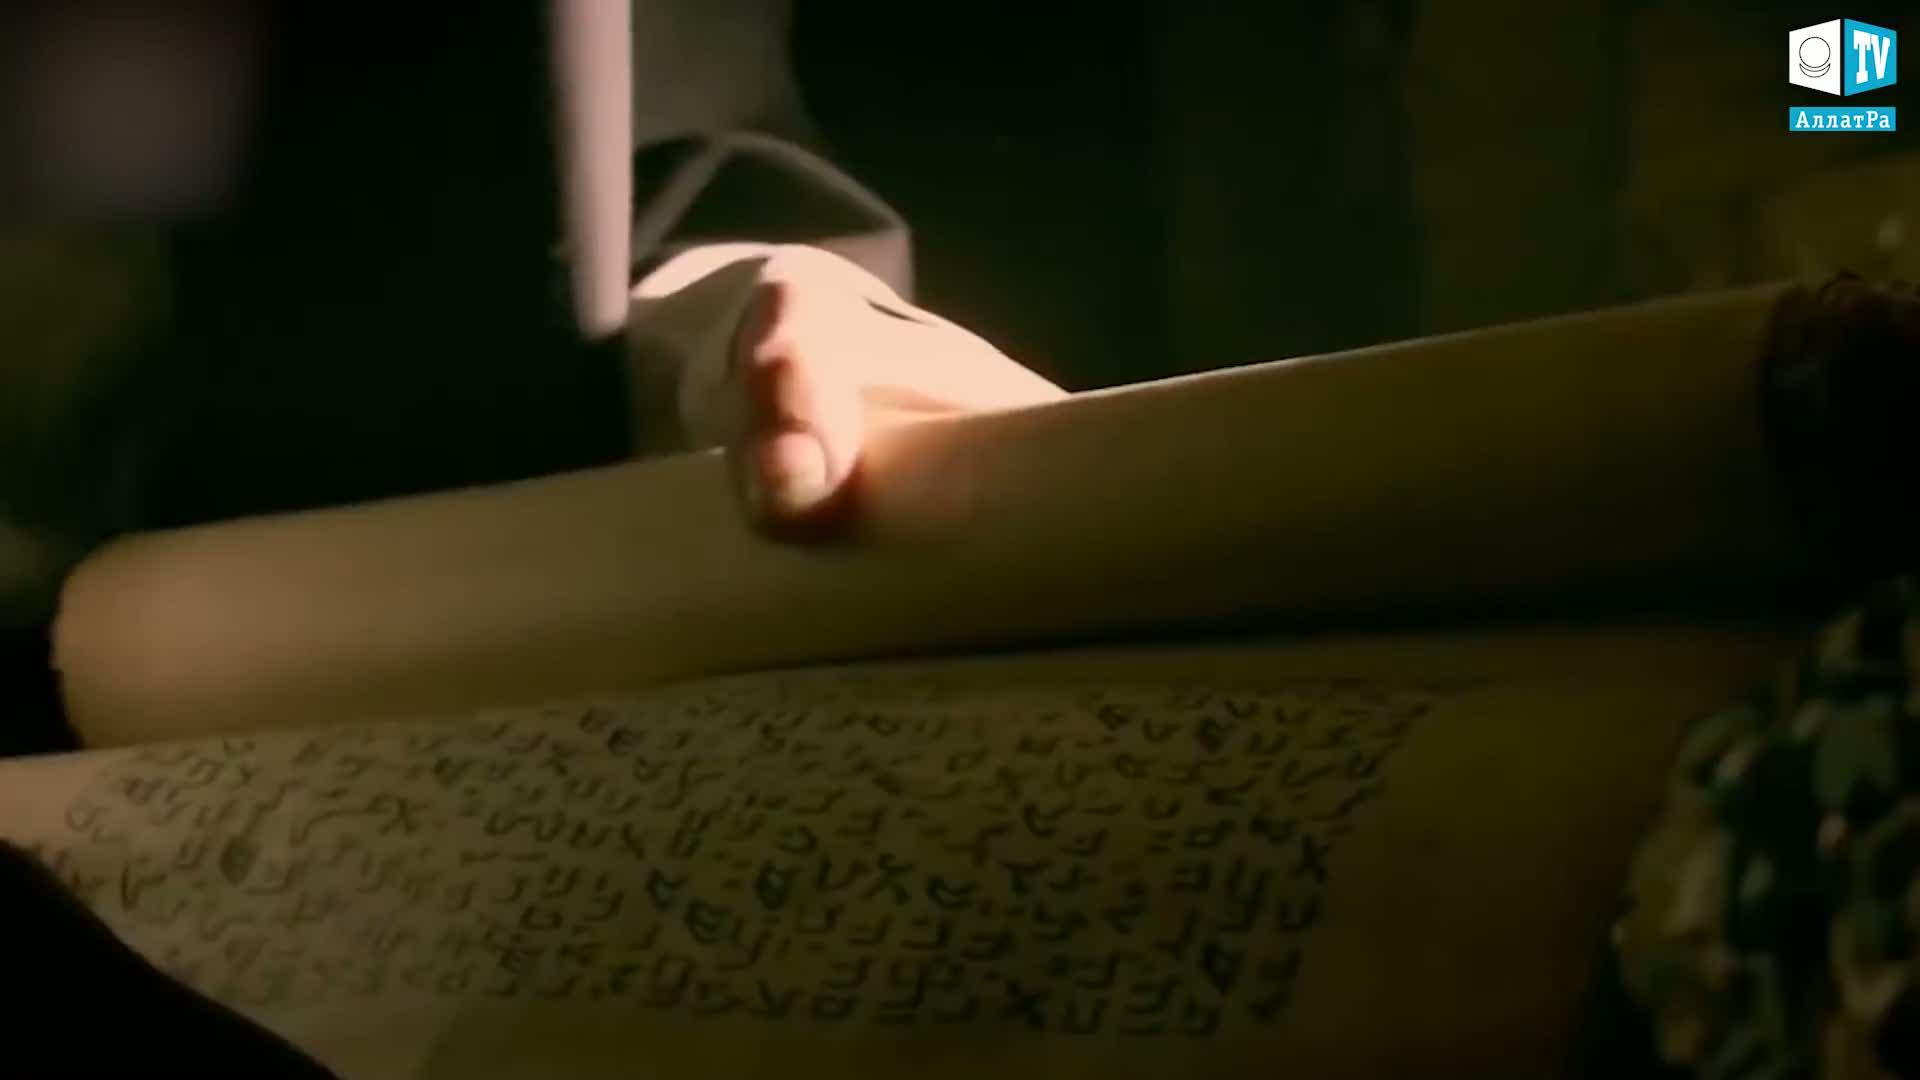 Starodávné texty 4. Foto